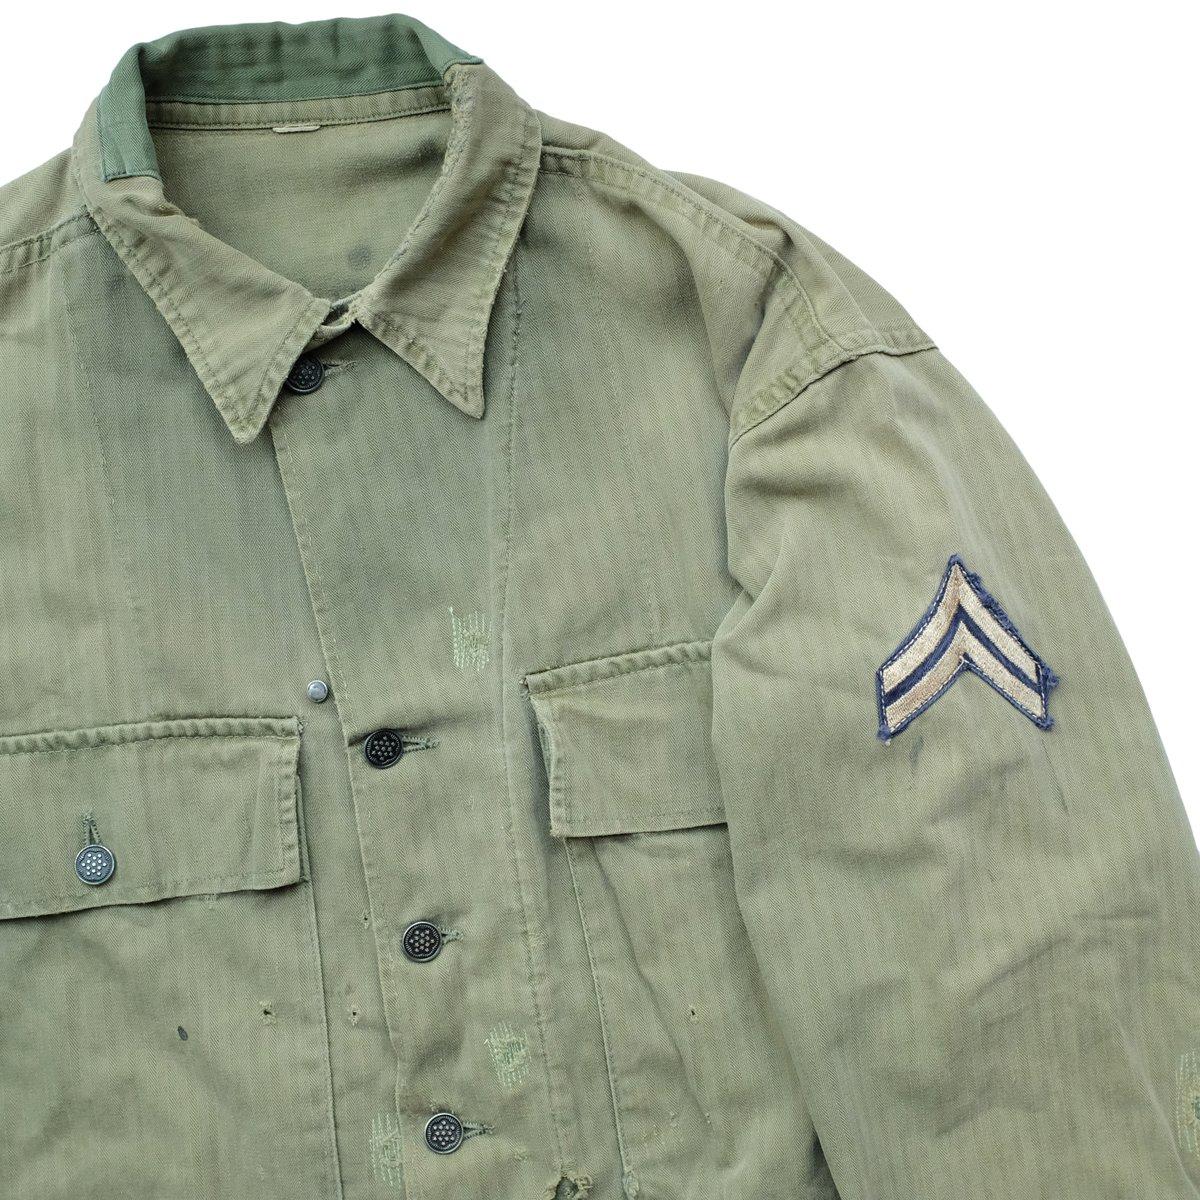 Image of 1940s Vintage M-43 HBT Jacket with Artwork/Stencil